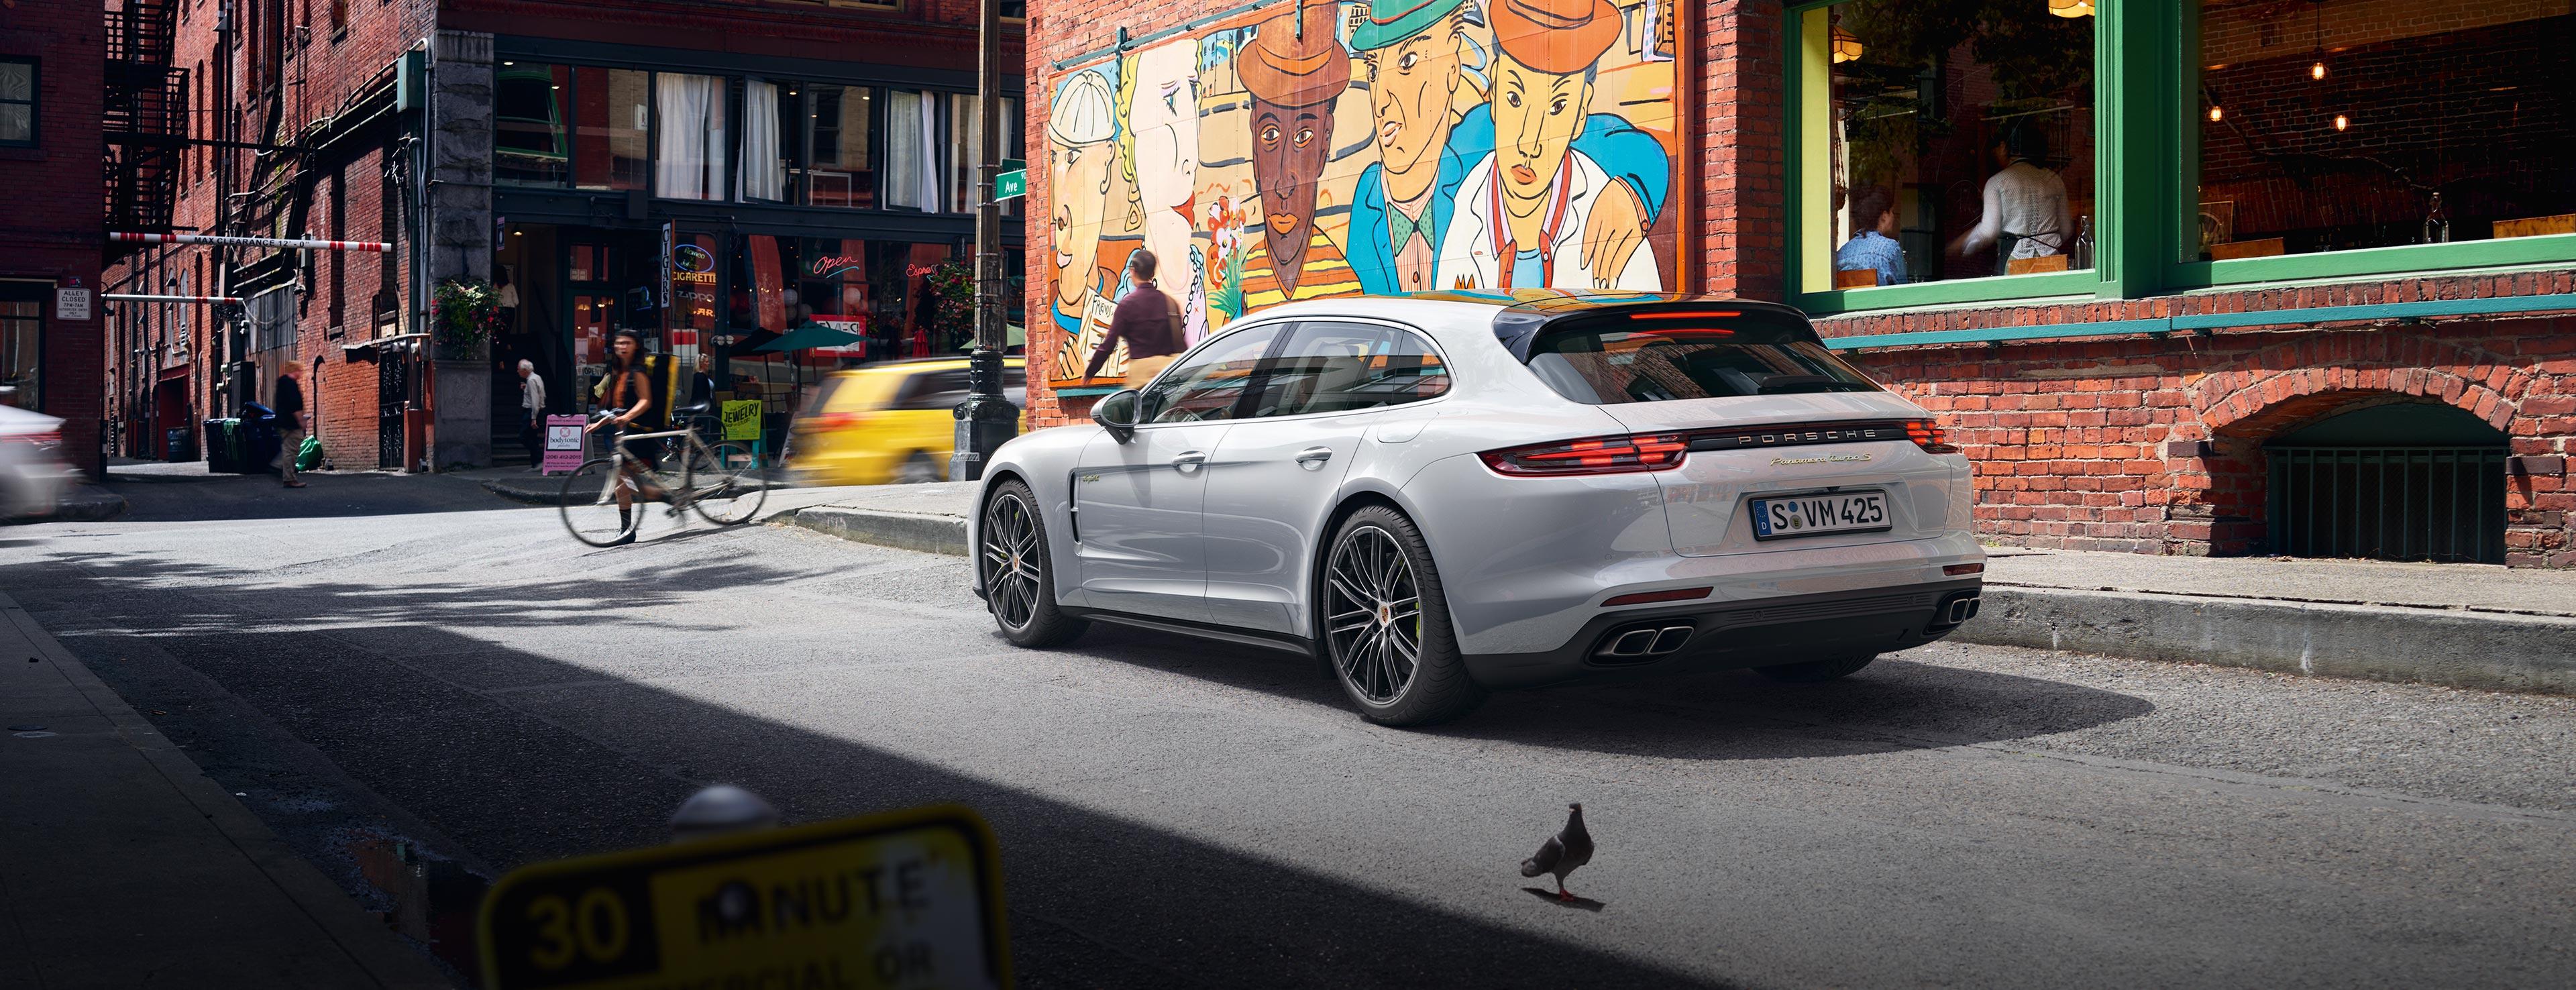 Porsche Italia Dr. Ing. h.c. F. Porsche AG